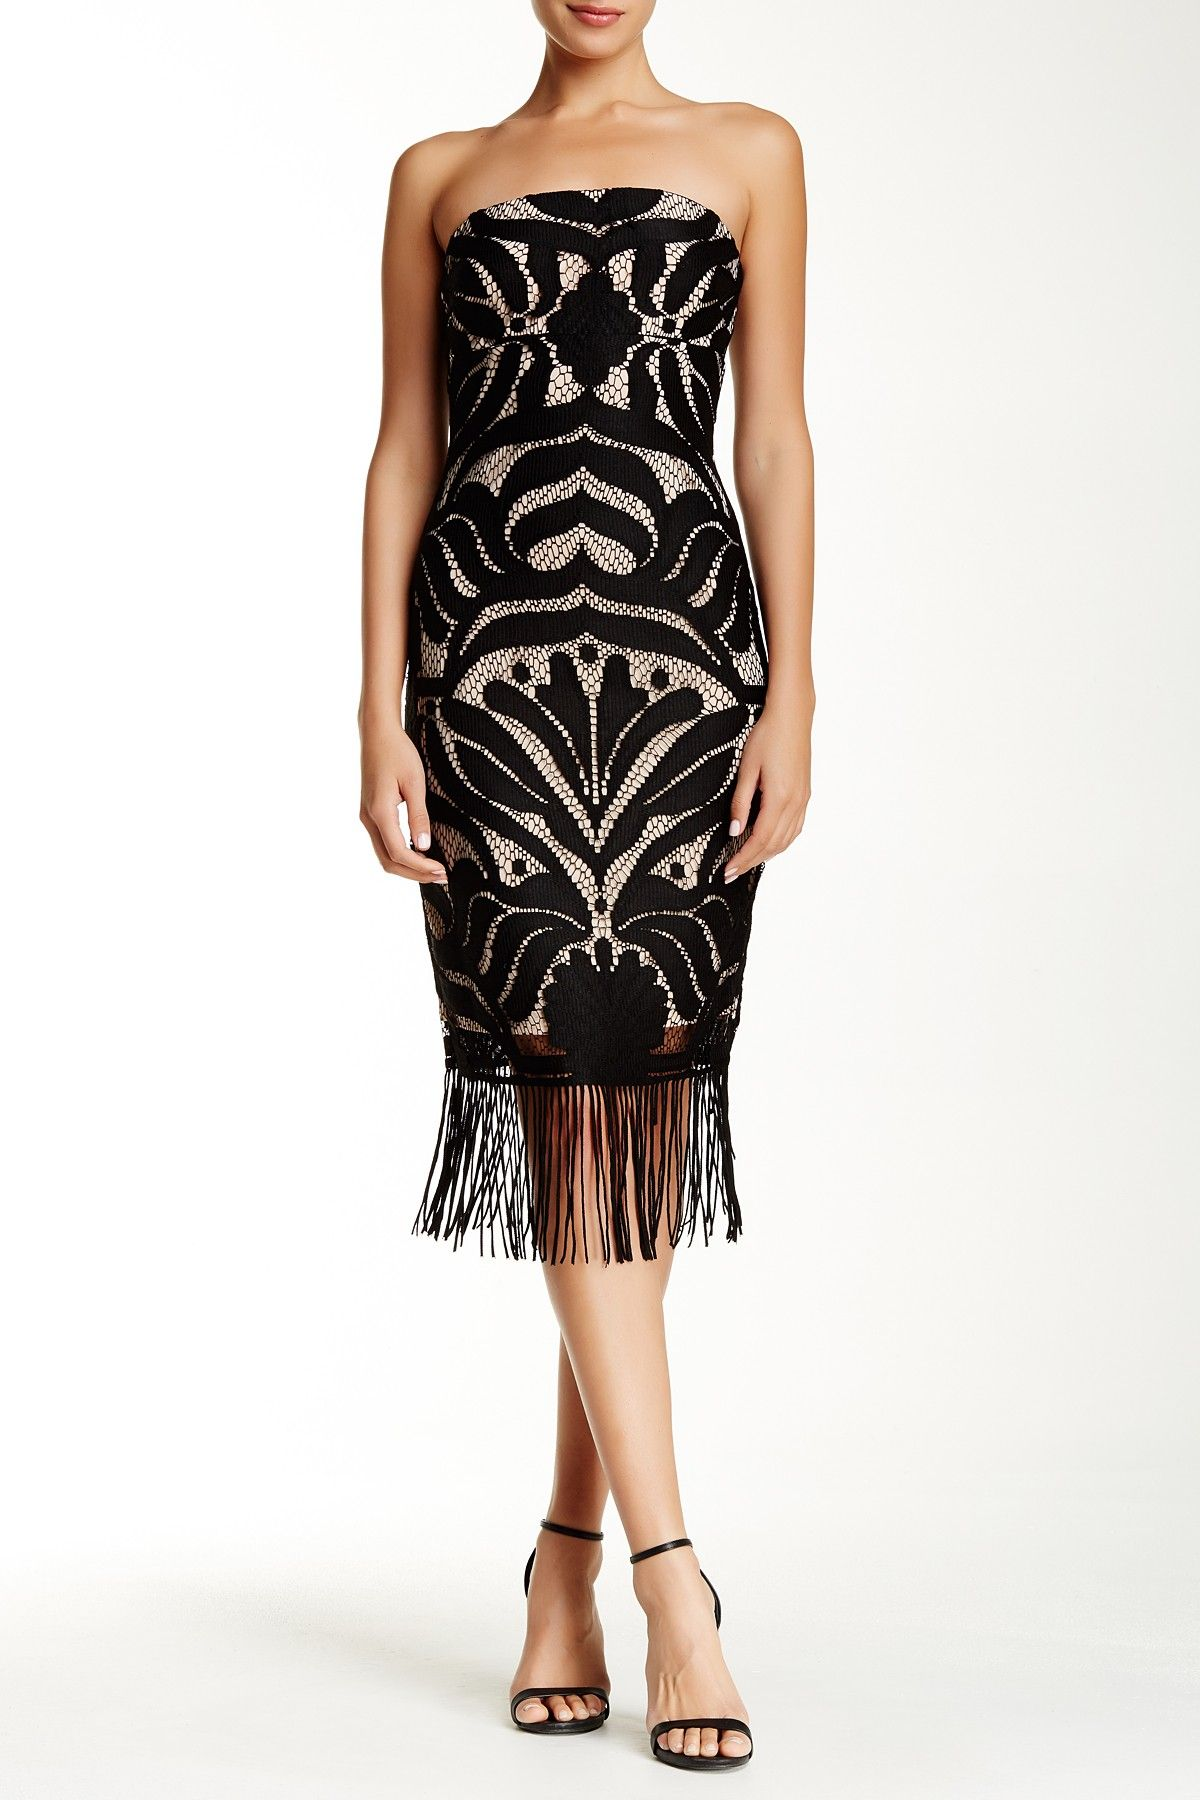 54a2066a94bb Nordstrom Rack Semi Formal Dresses | Saddha